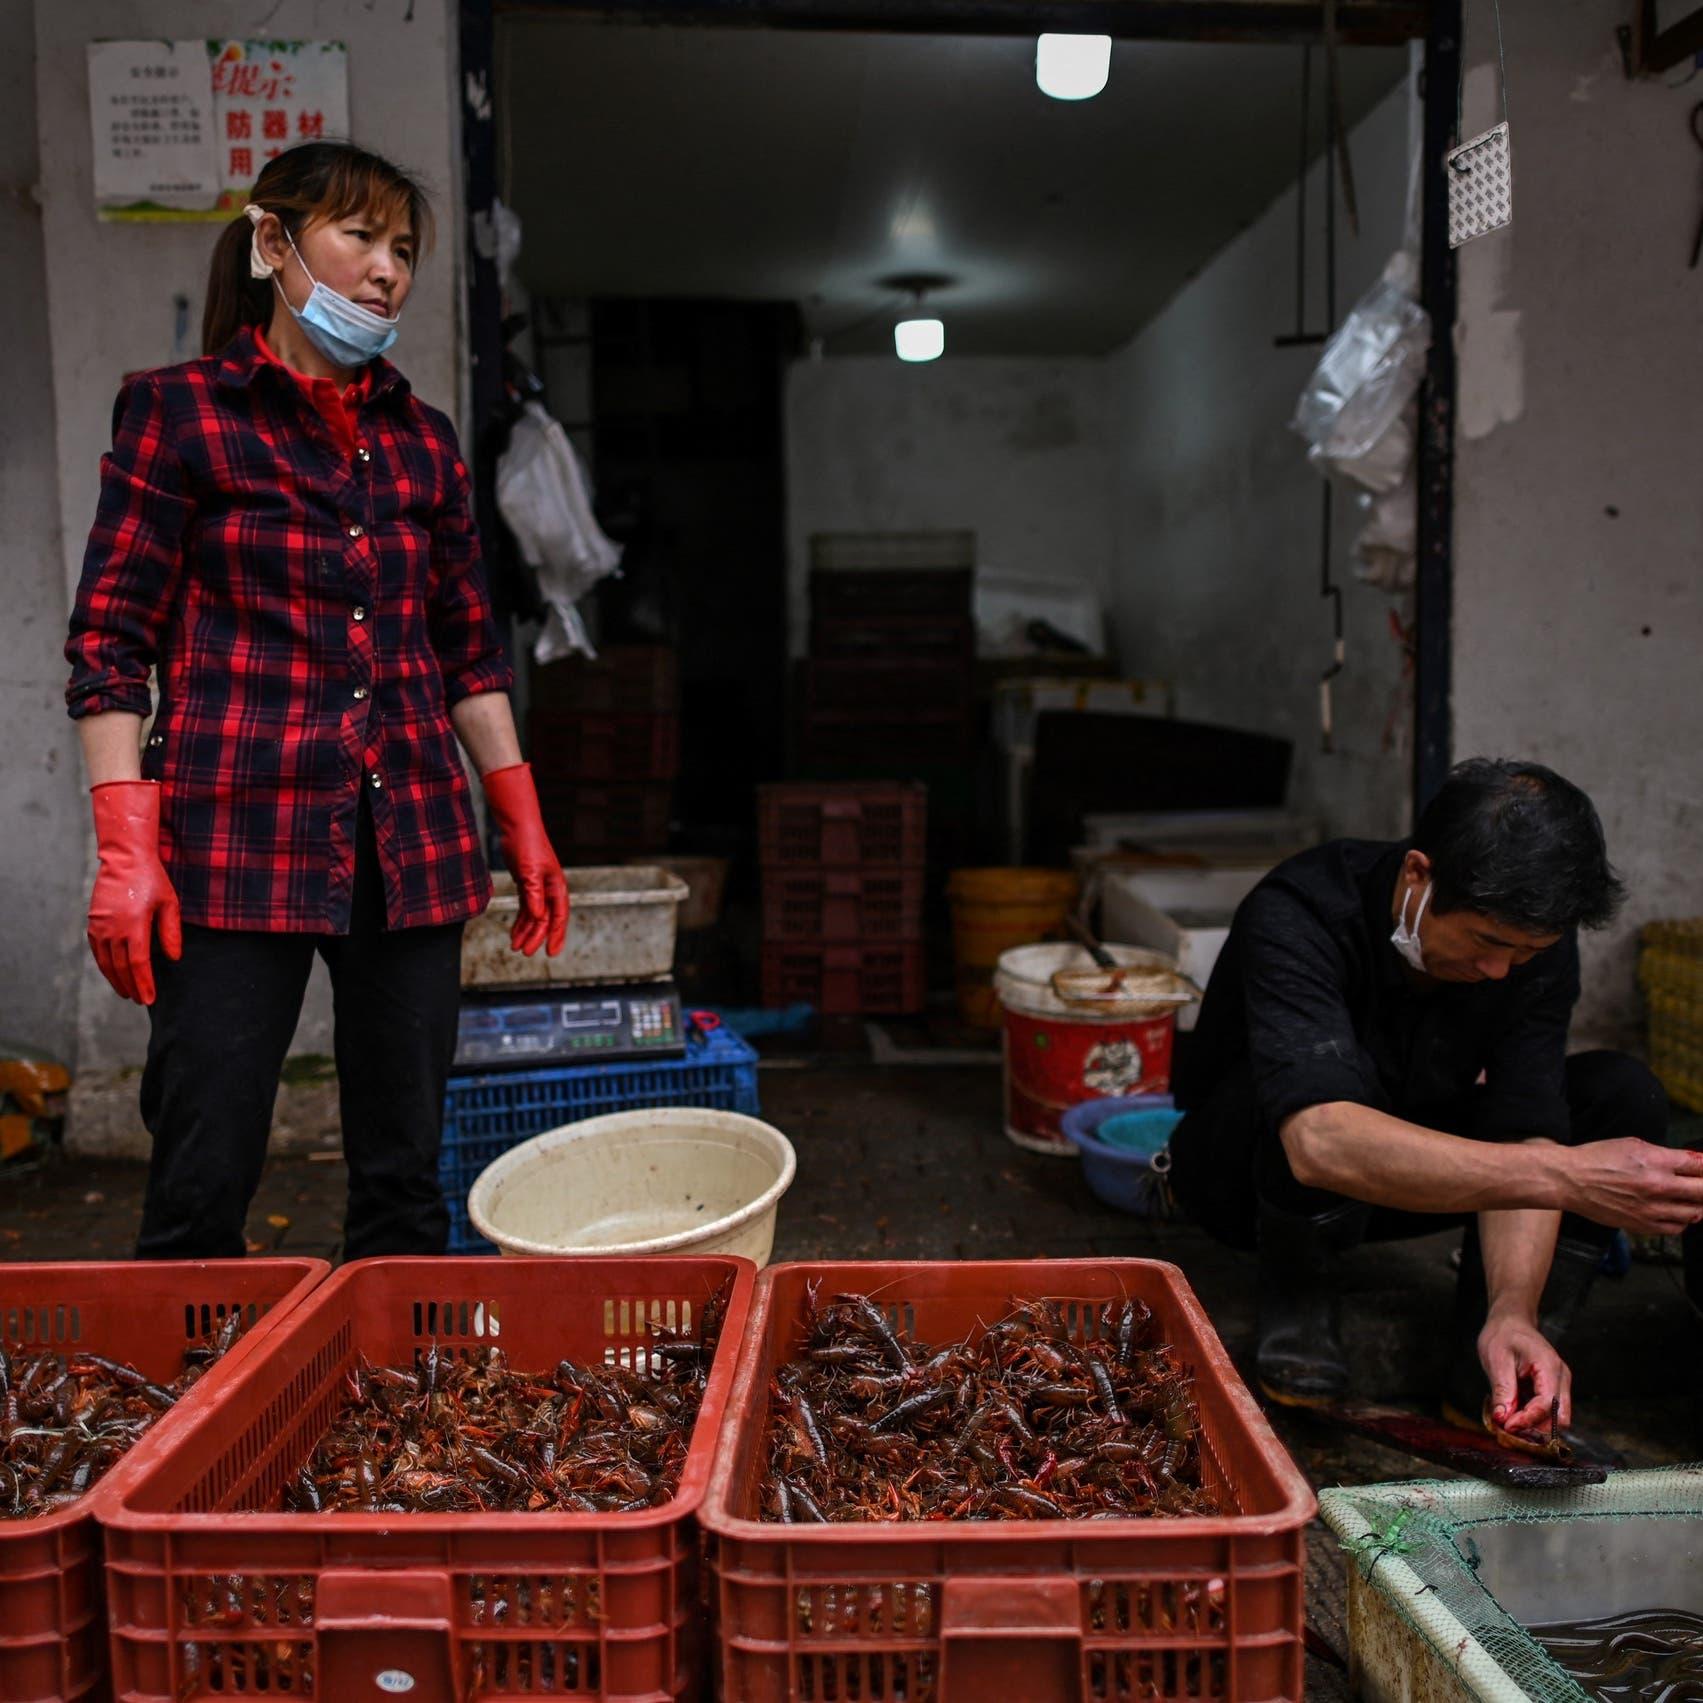 47 ألف حيوان حي كان مطروحاً في أسواق ووهان قبل كورونا